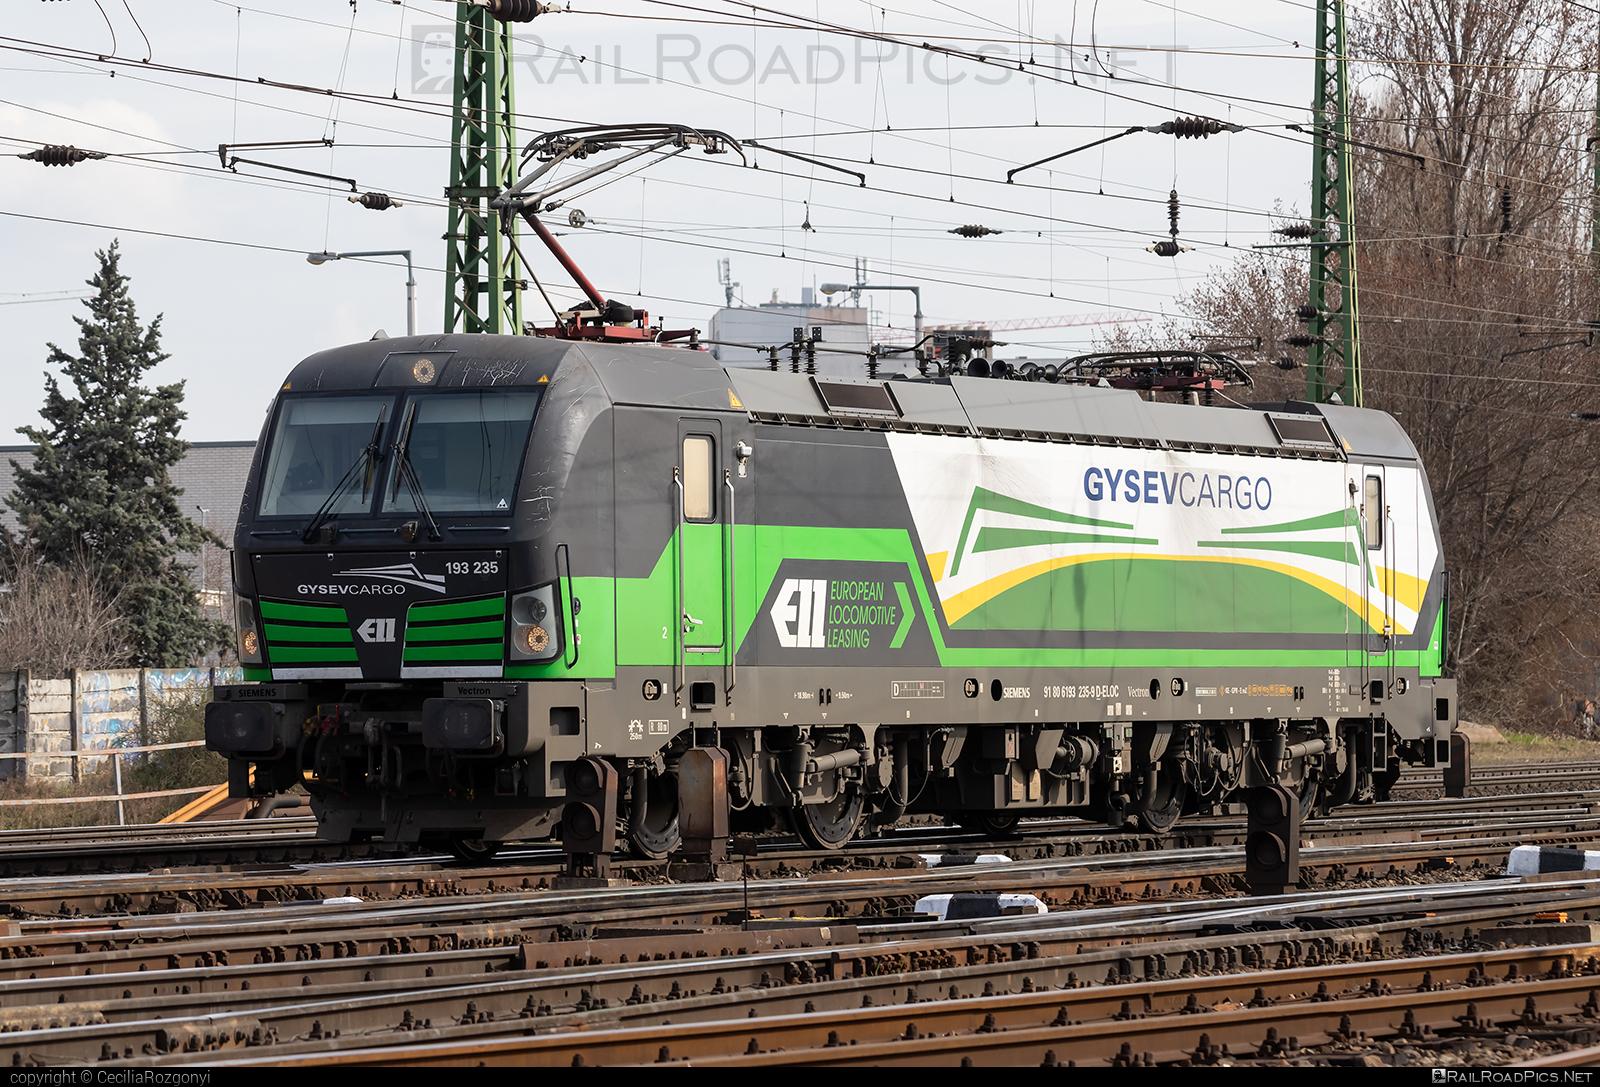 Siemens Vectron AC - 193 235 operated by GYSEV Cargo Zrt #ell #ellgermany #eloc #europeanlocomotiveleasing #gysev #gysevcargo #siemens #siemensvectron #siemensvectronac #vectron #vectronac